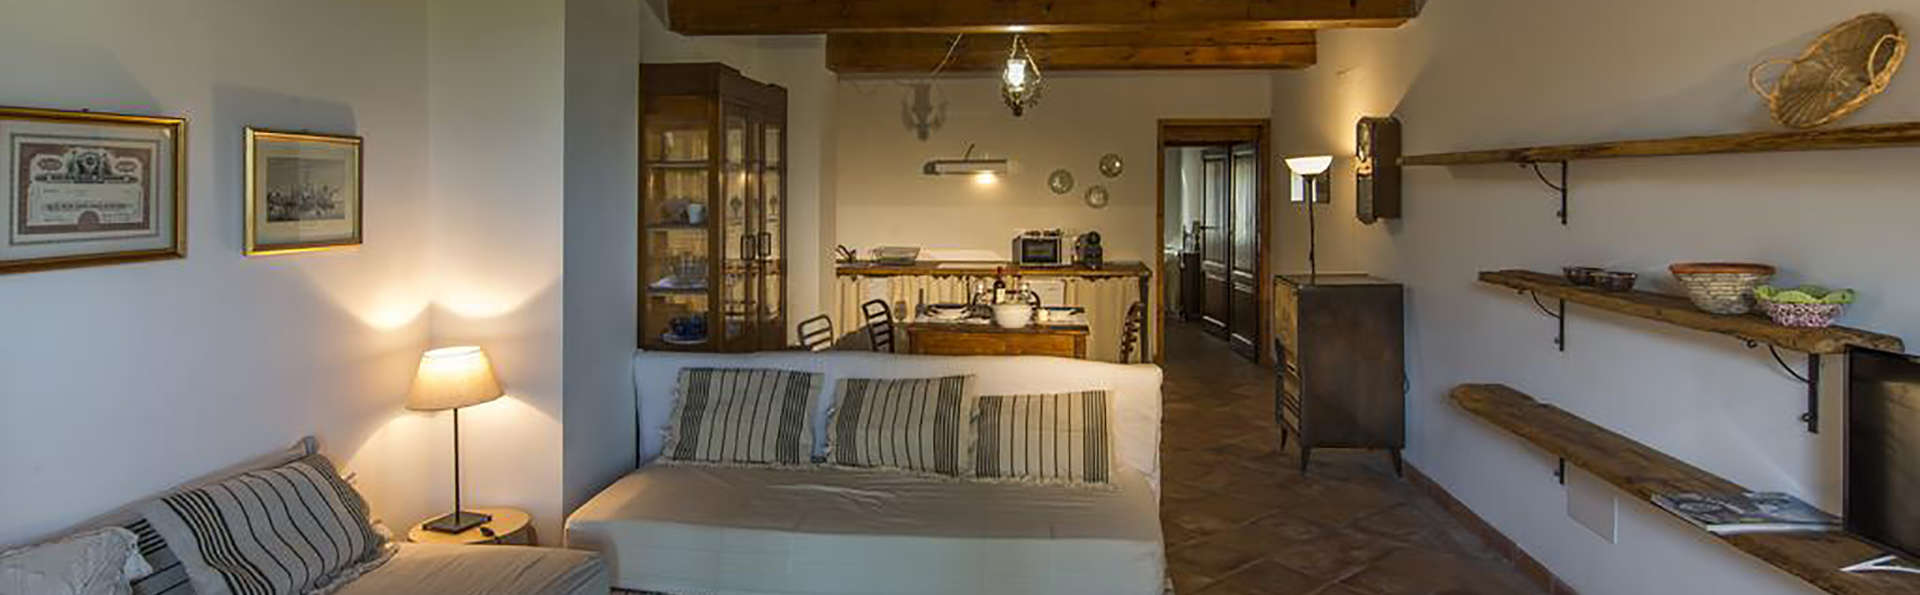 Casa Vacanze Le Fornaci - Edit_Lobby.jpg